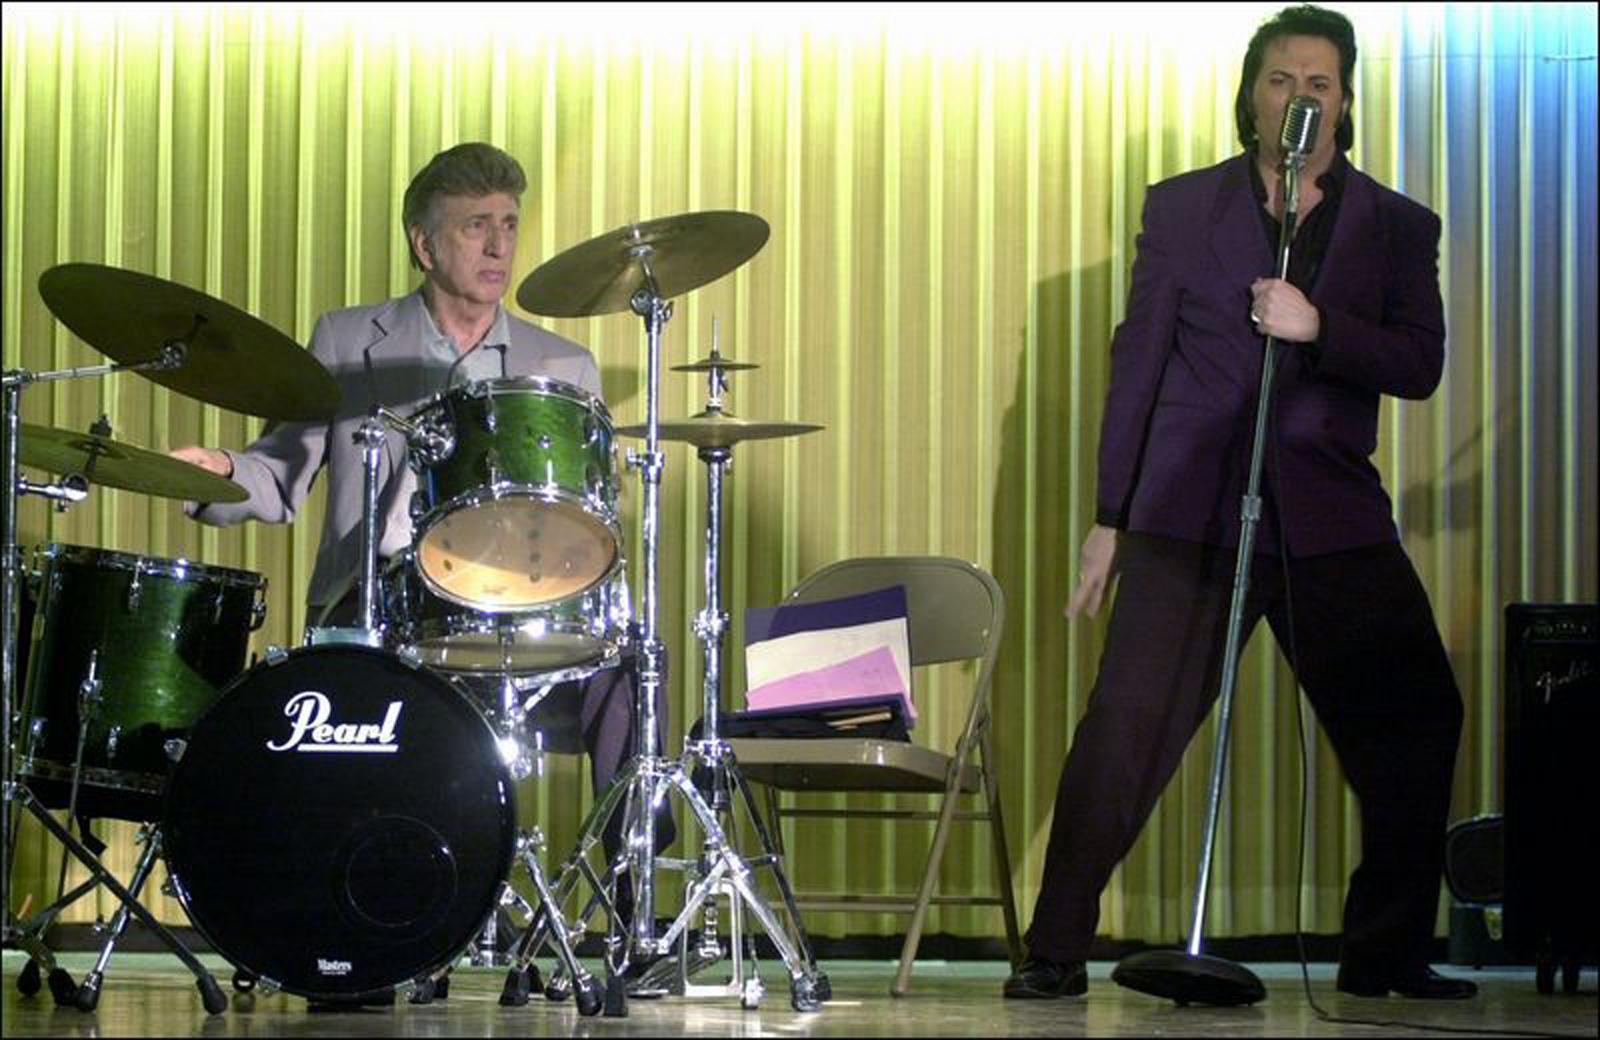 Elvis' original drummer DJ Fontana and Brent performing at an Elvis Festival in Toledo, OH